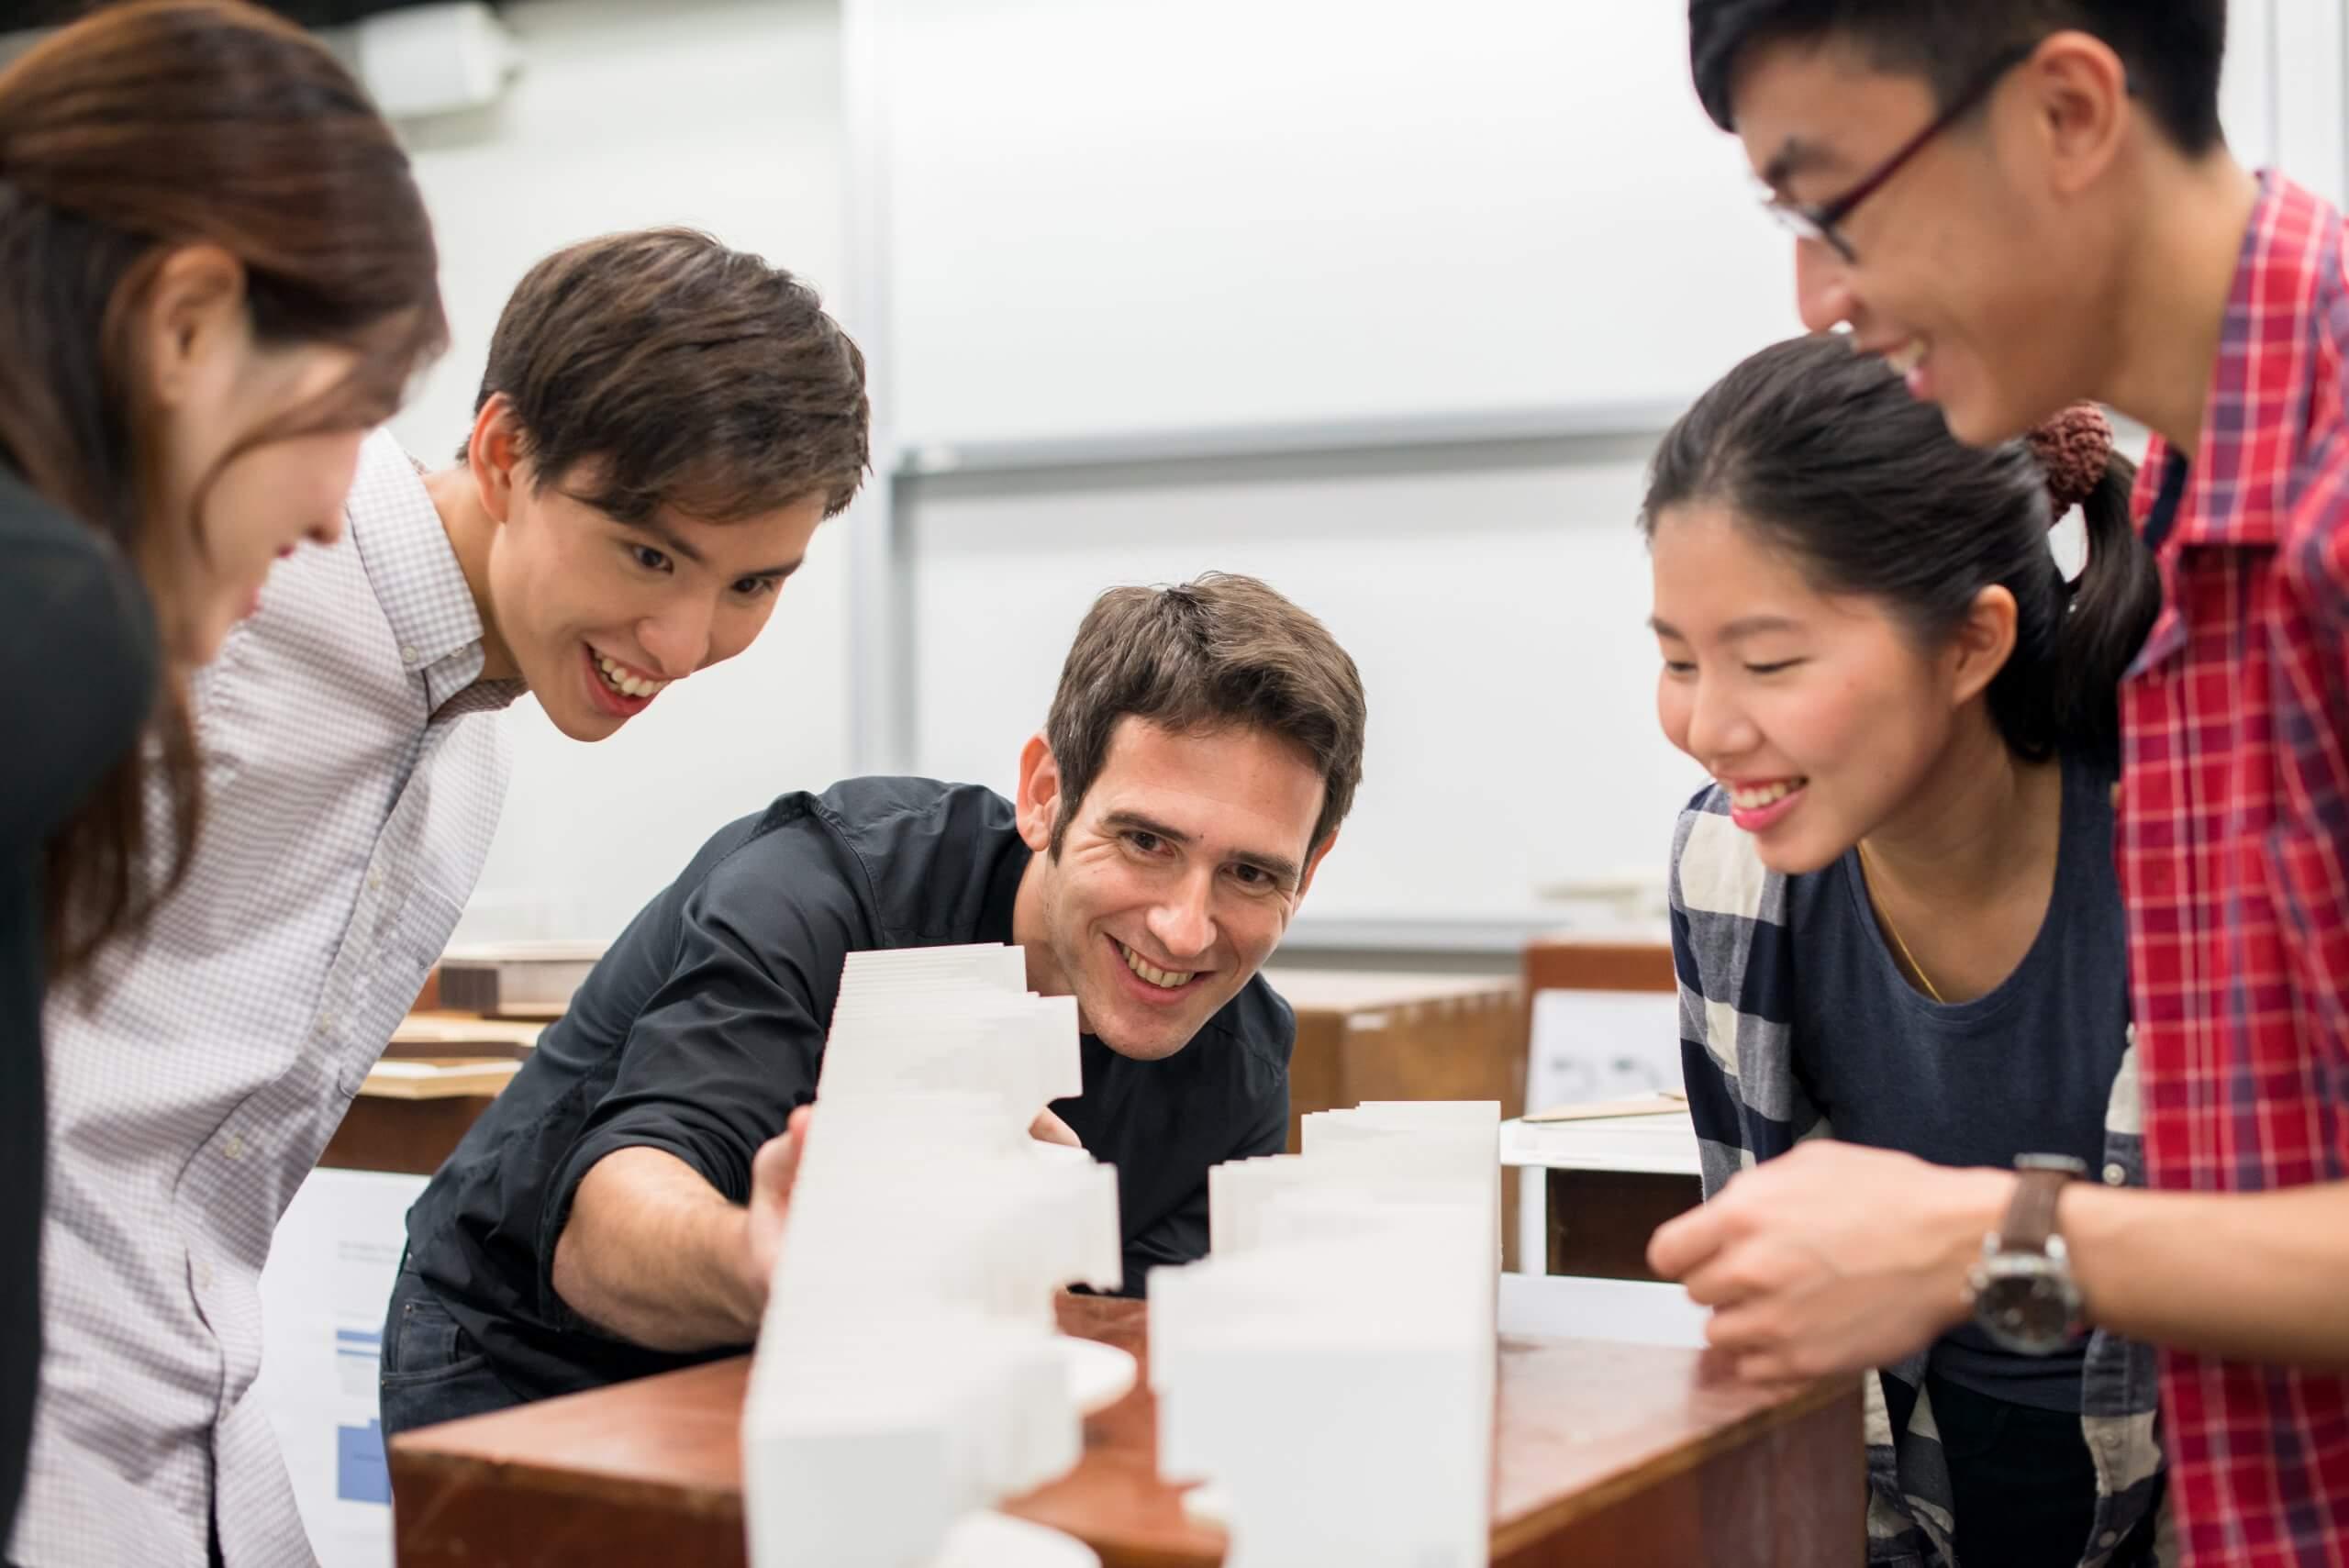 Singapore University of Technology and Design